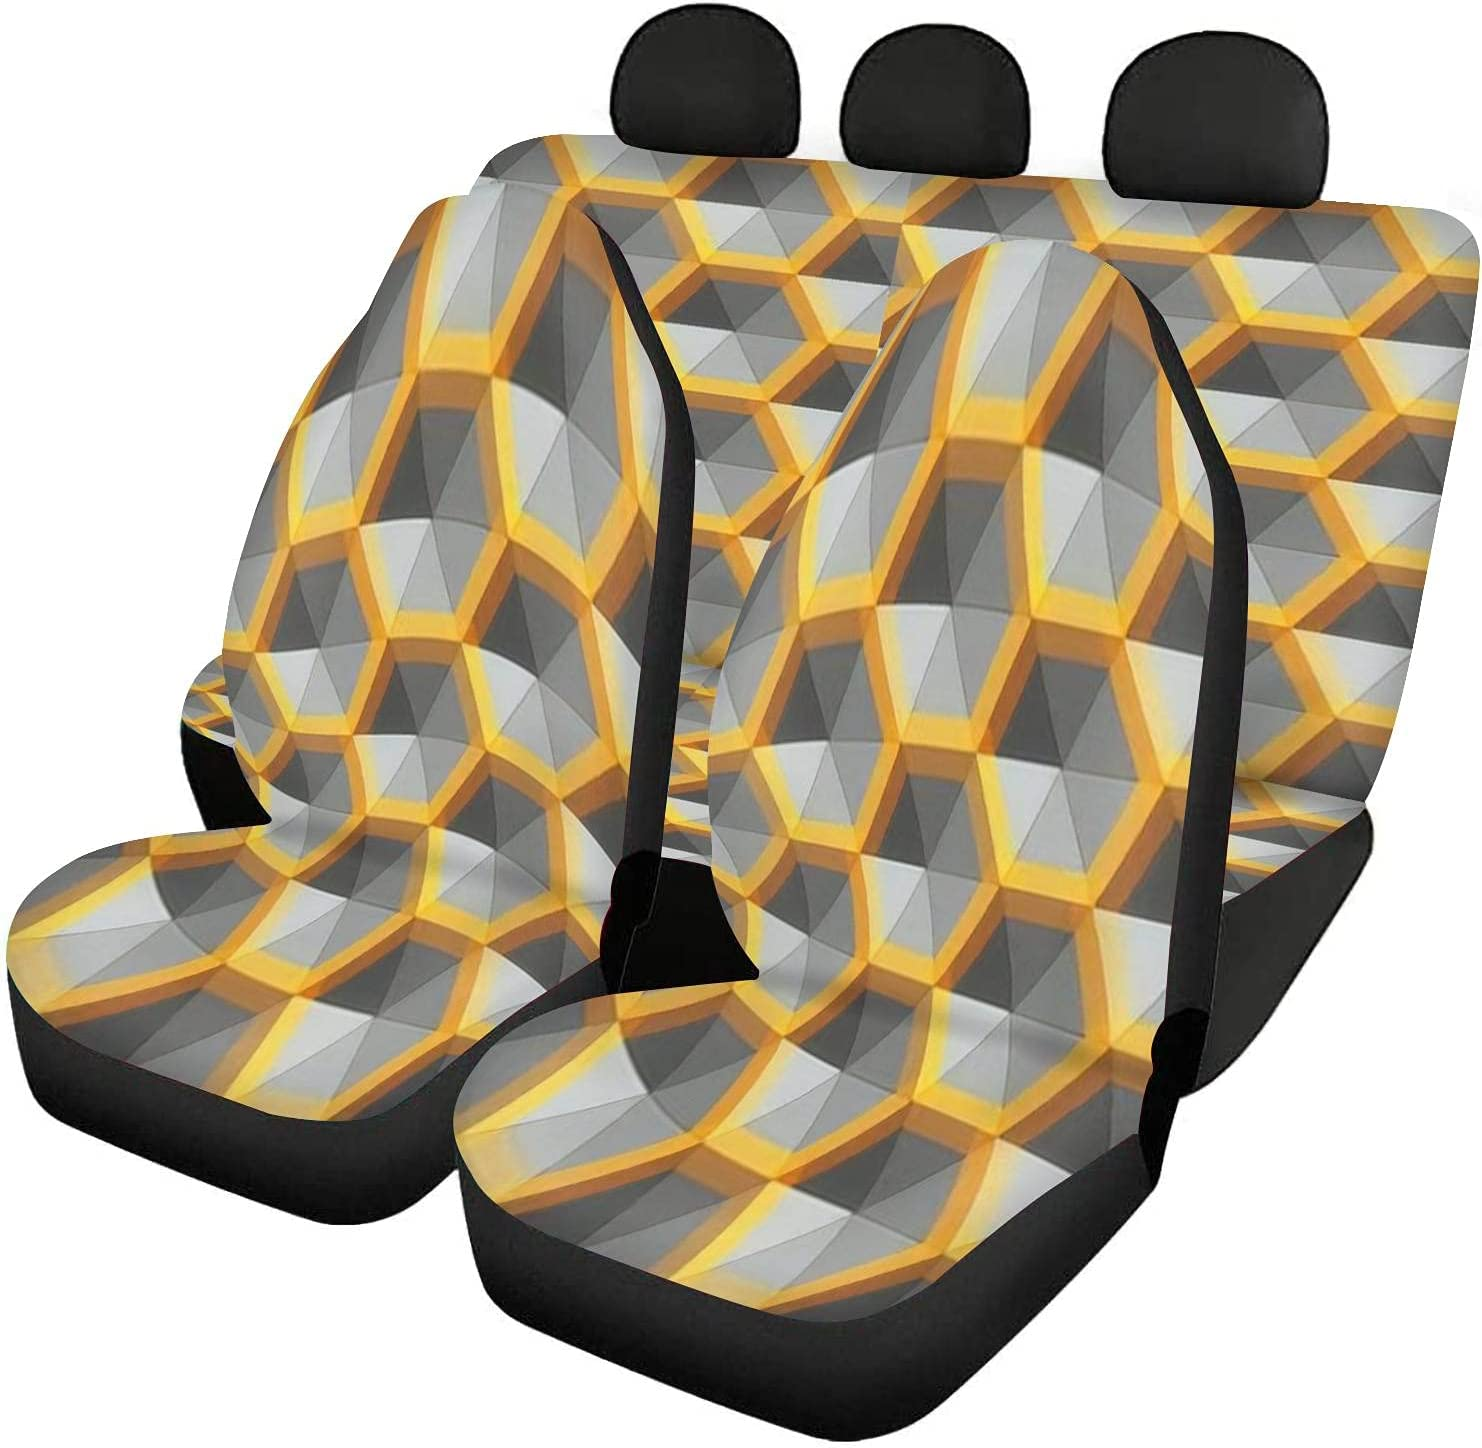 GDSJEGQM Car free Seat Covers Virginia Beach Mall Full Set Silver - Hexagon Abst and Gold